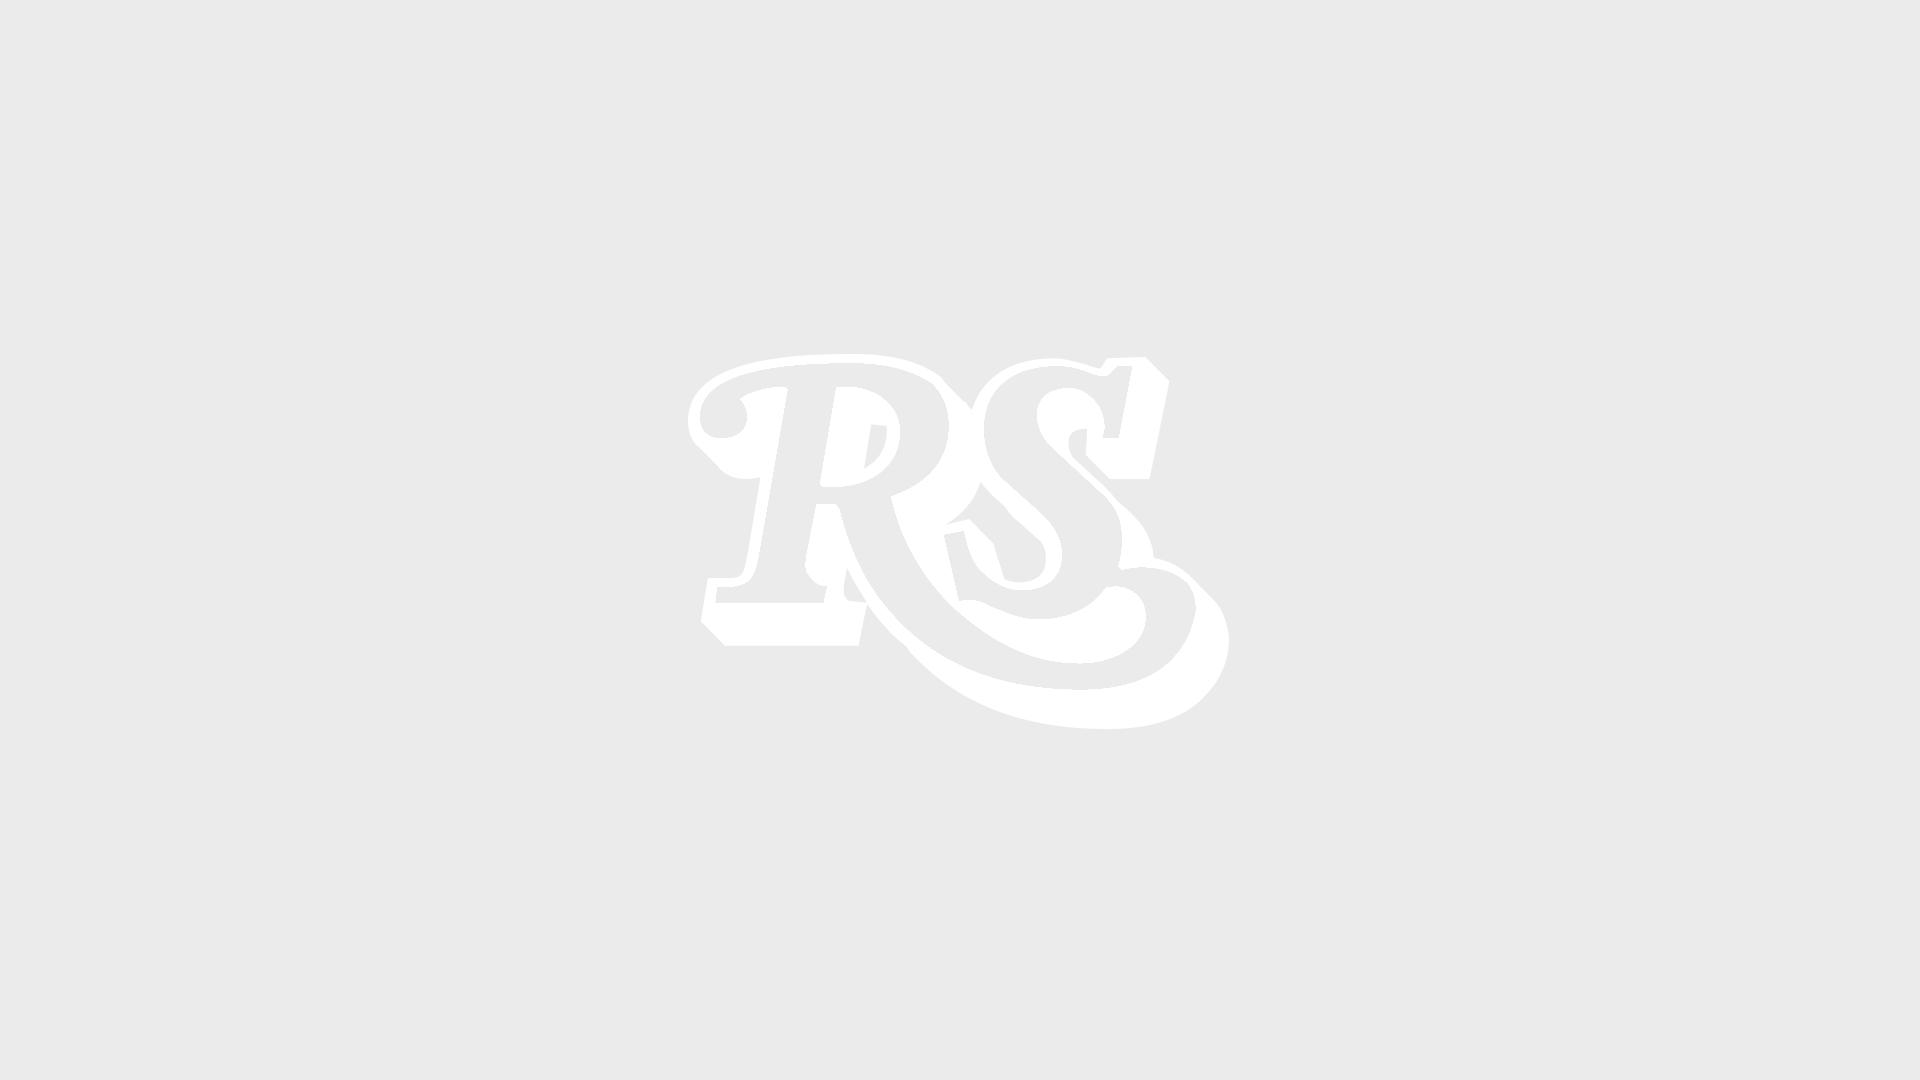 Mumford & Sons: Best British Group